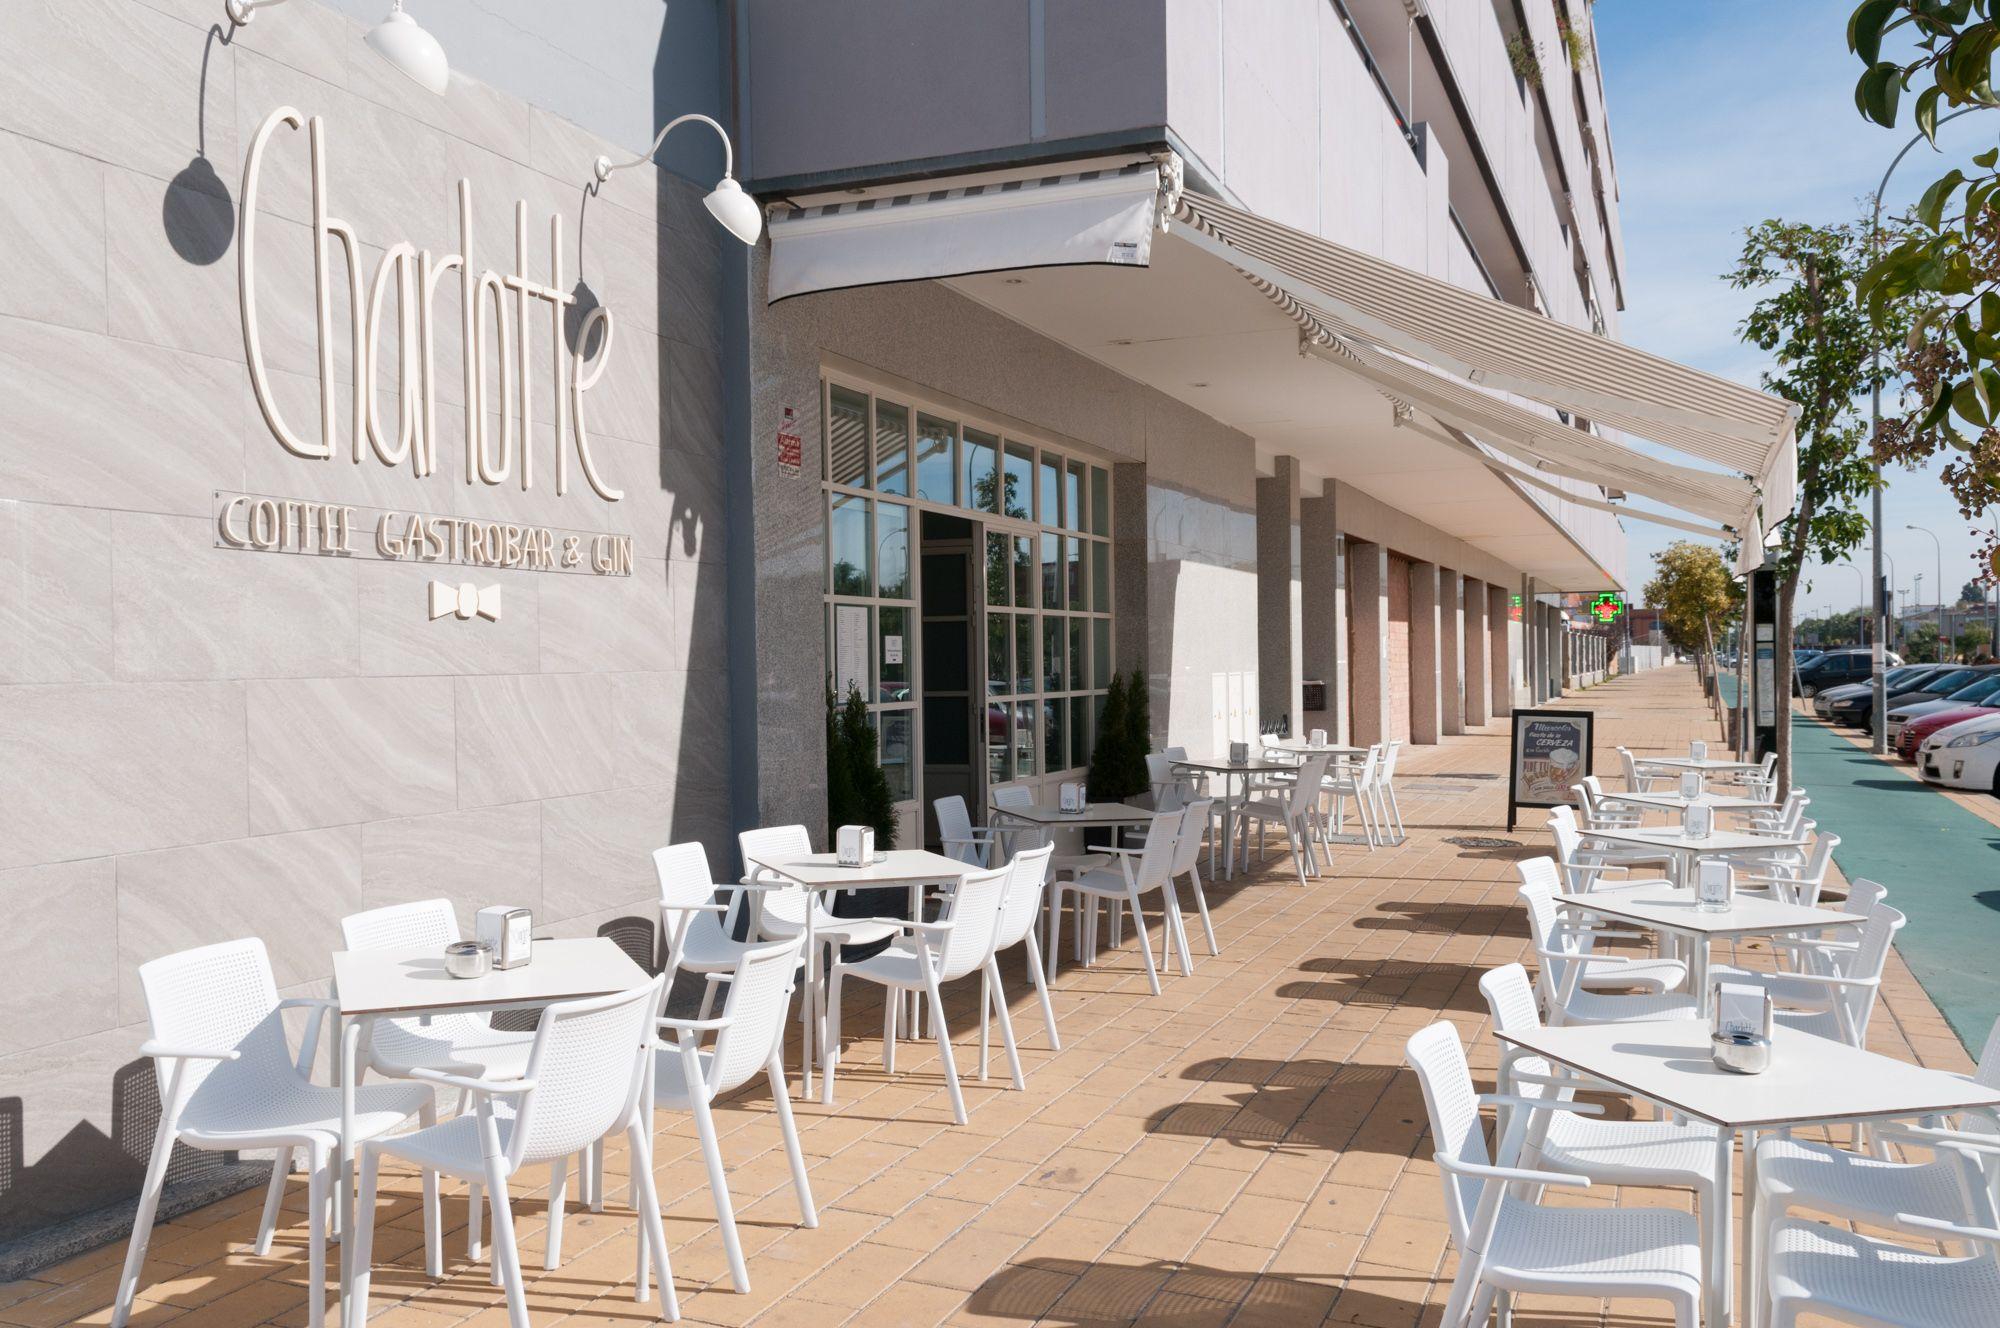 Charlotte Coffee Gastrobar & Gin | San José de la Rinconada (Sevilla ...